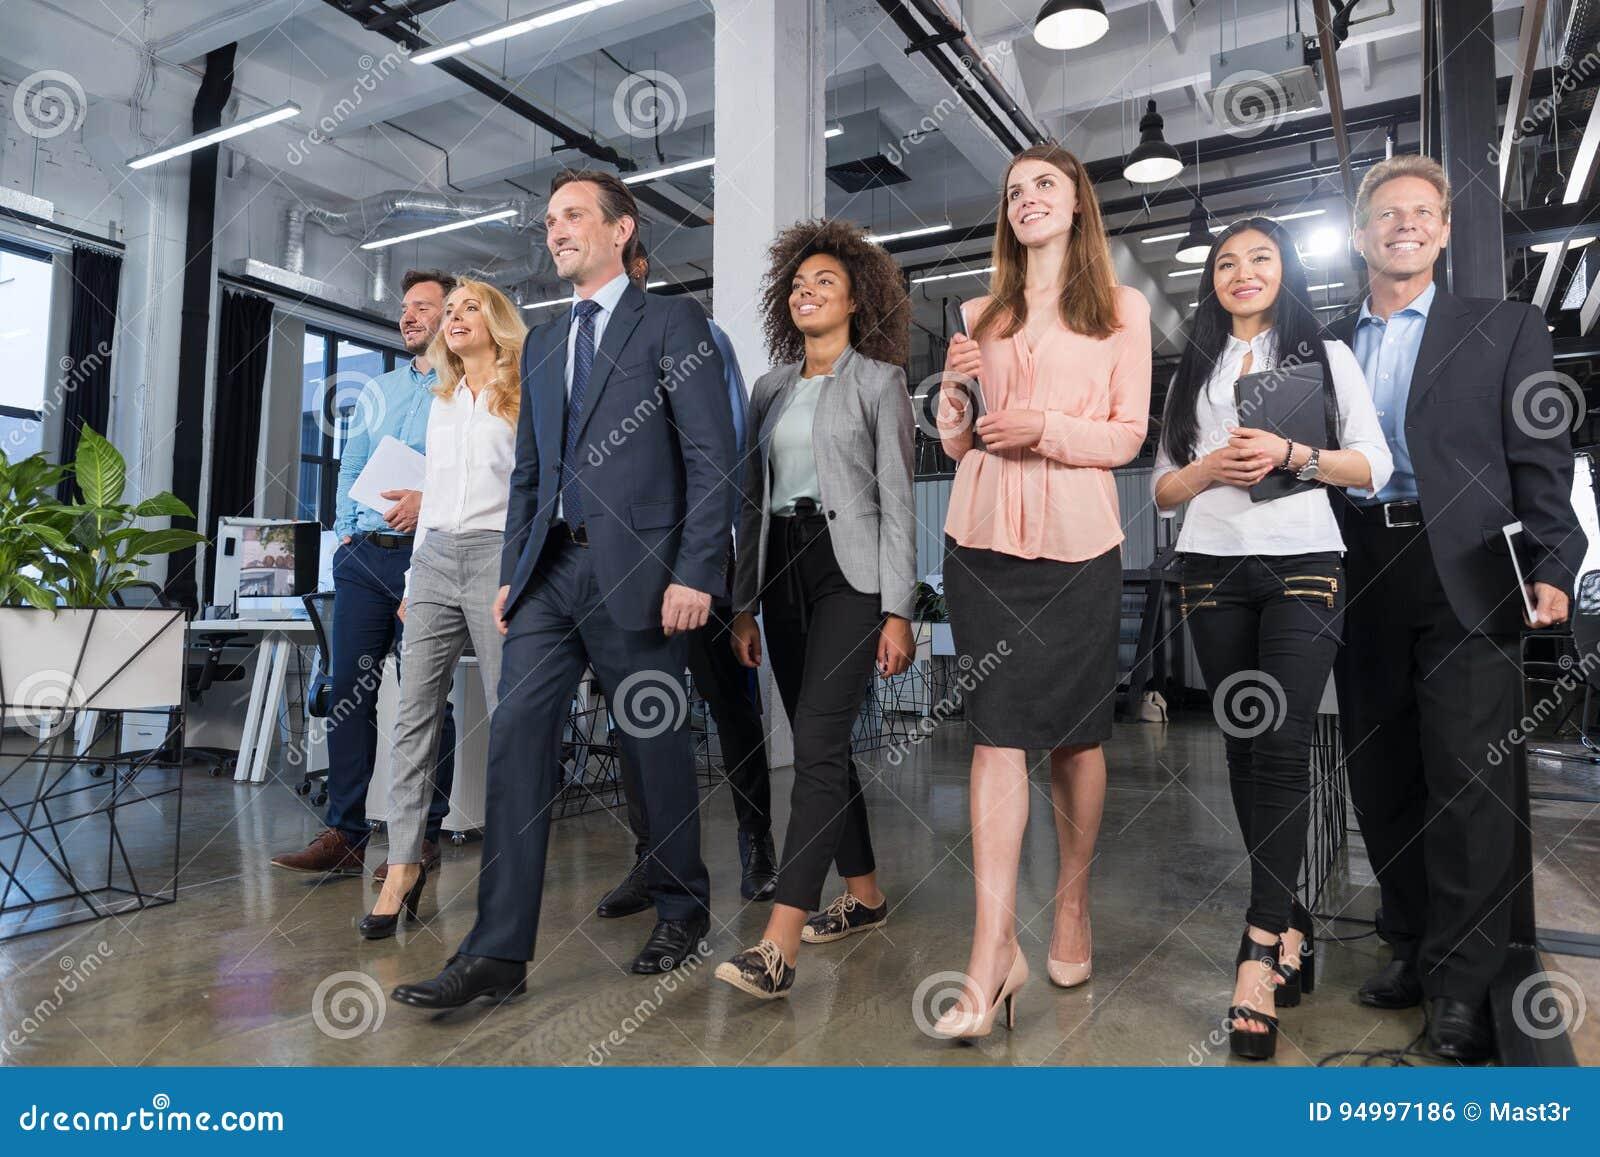 Volledige Lengte Bedrijfsmensen Team Walking In Modern Office, Zekere Zakenlieden en Onderneemsters in Kostuums Divers met